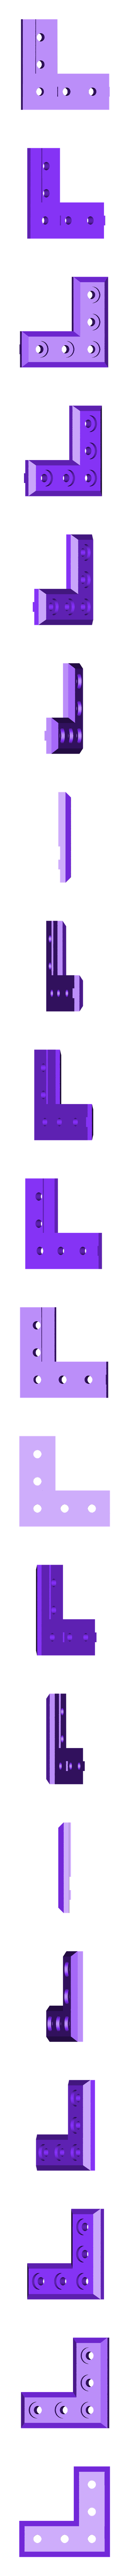 2020_Corner_Plate_5Screw_V2.stl Download free STL file 2020 Profile Aluminum 3D Printable Erector Set • 3D printer model, adamjvr